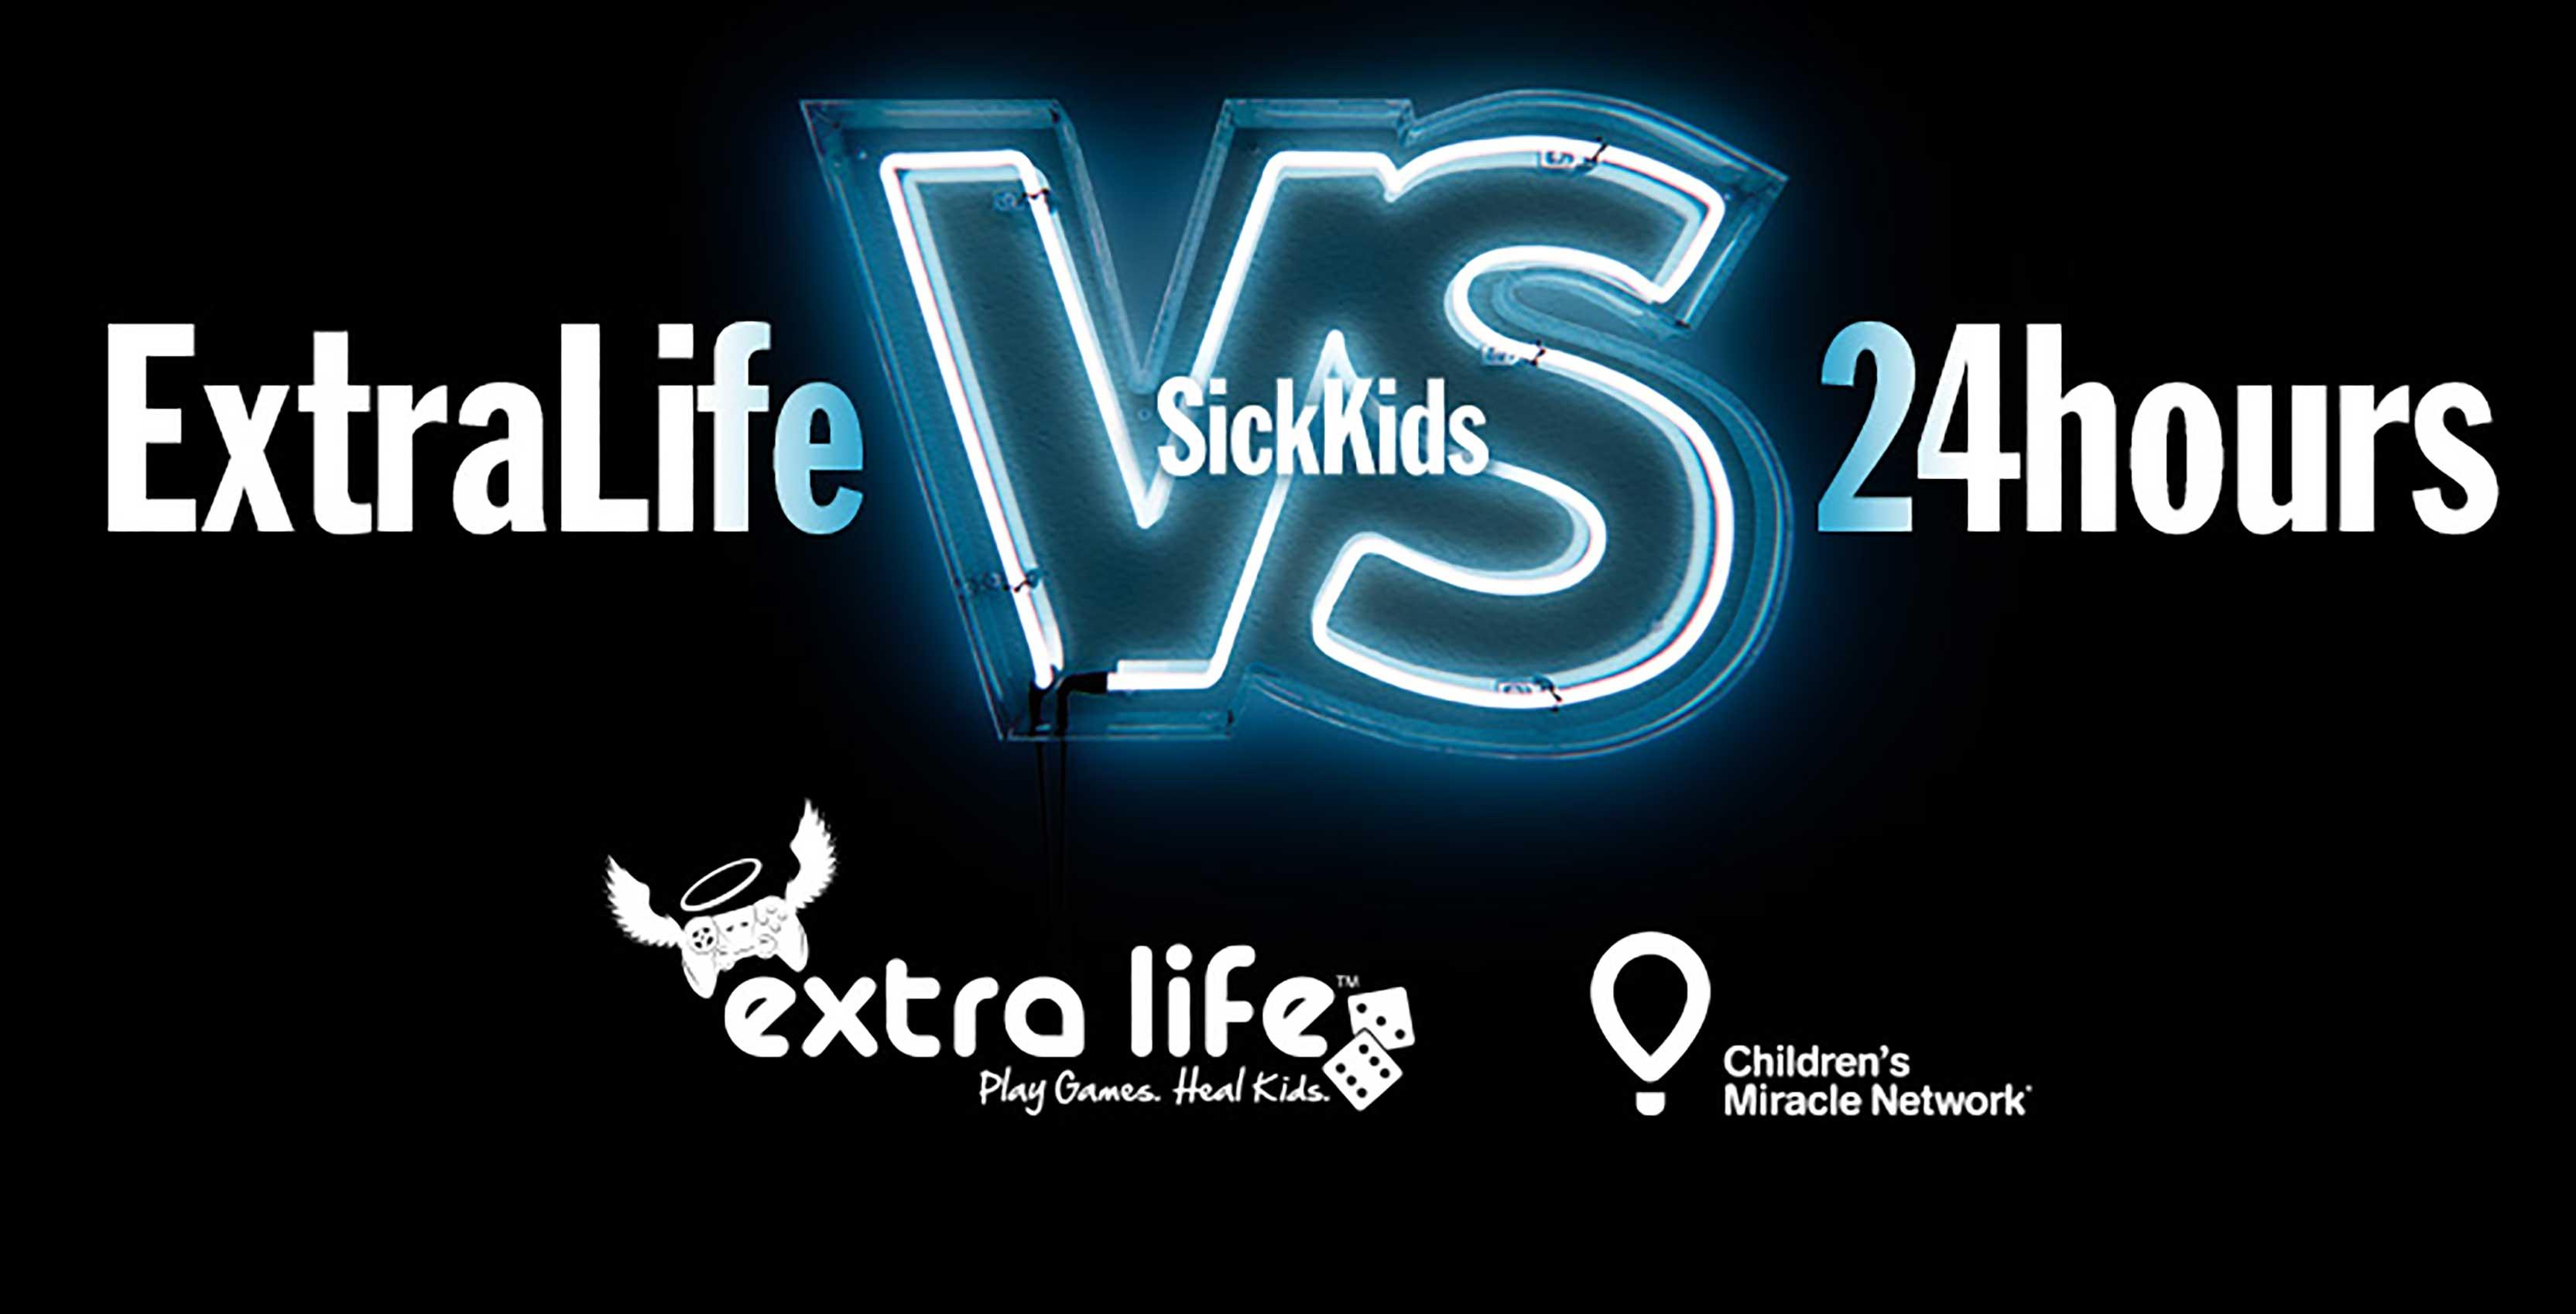 Extra Life SickKids